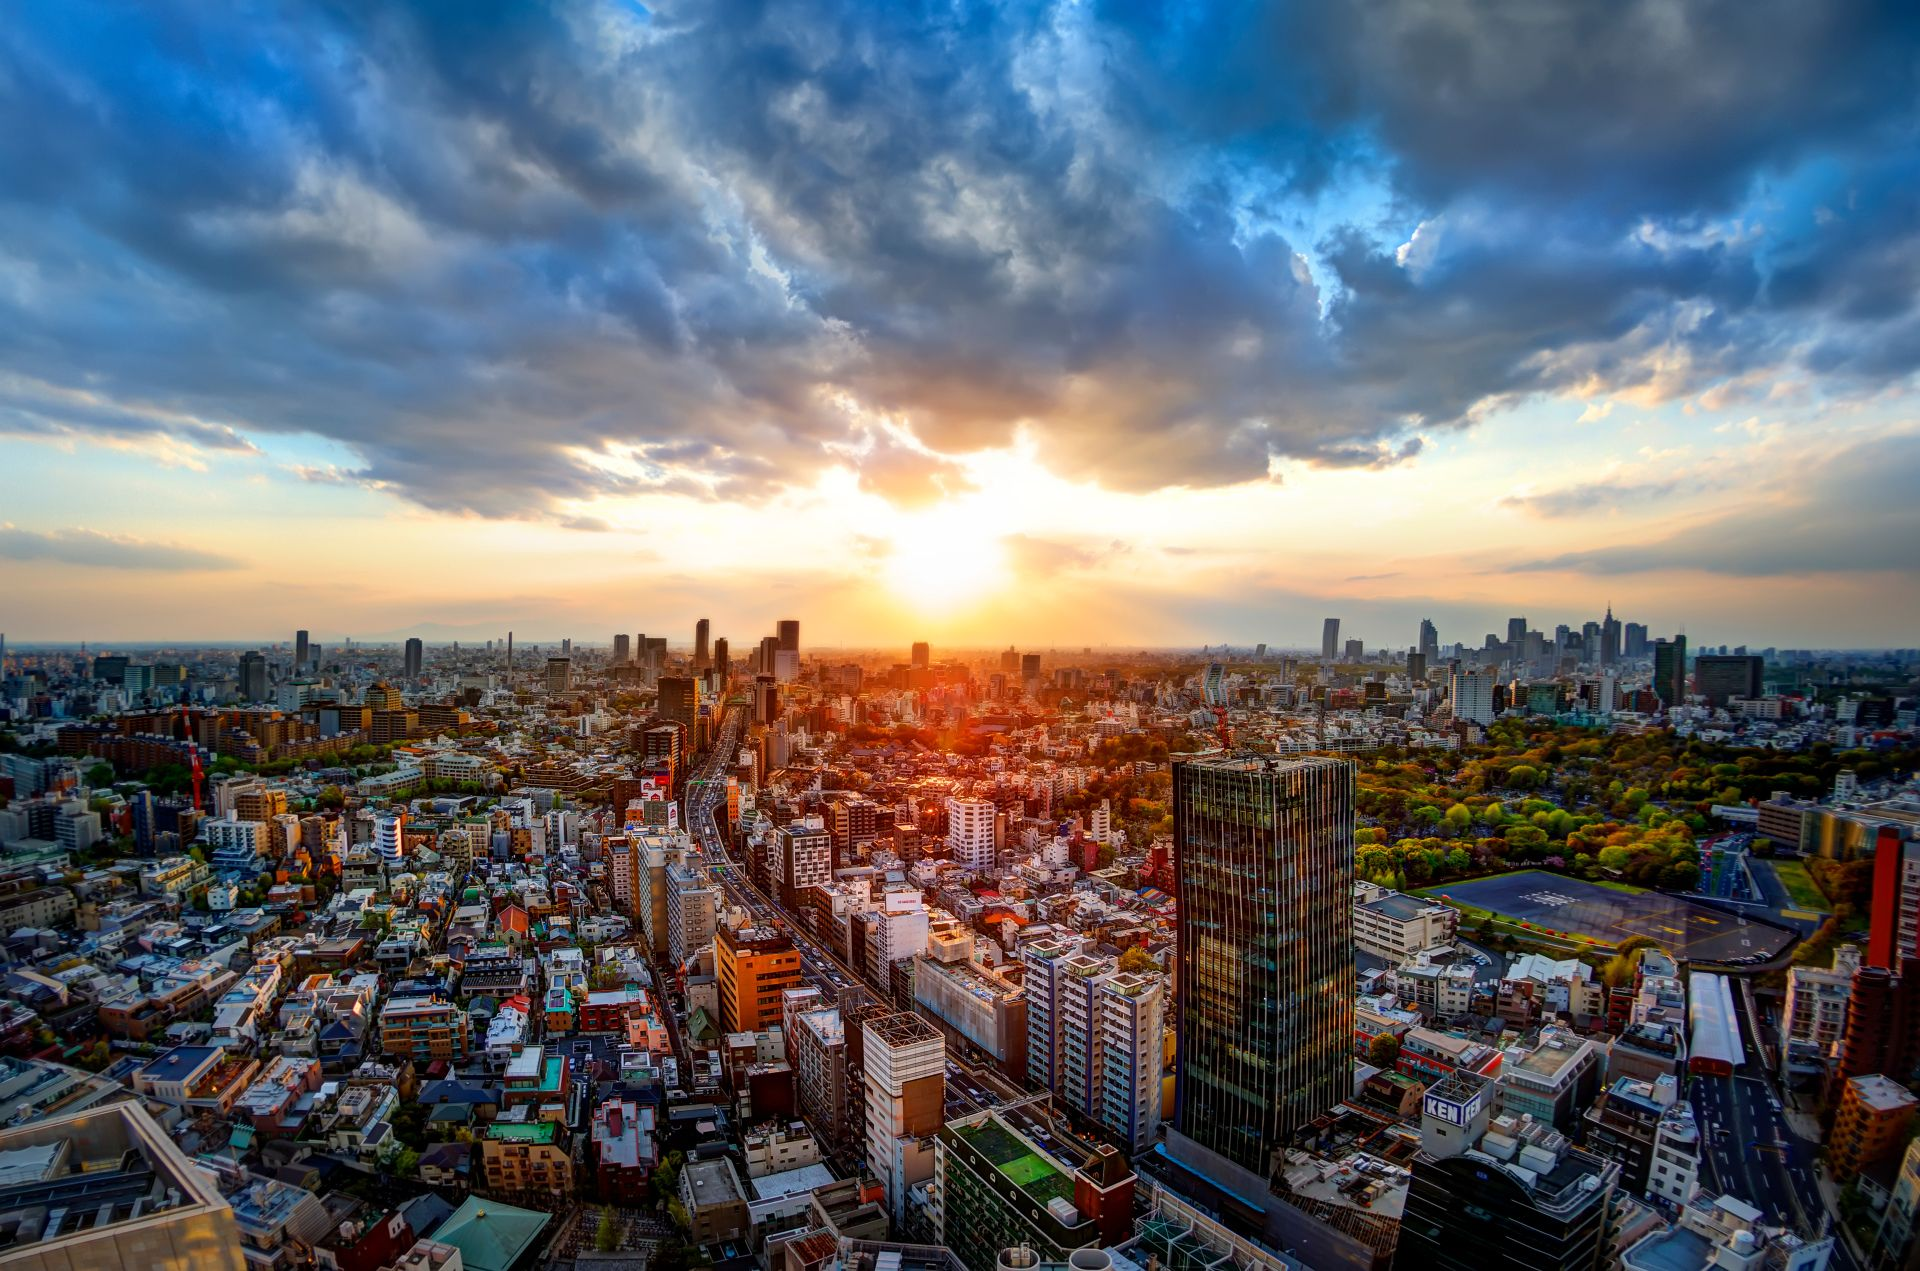 Man Made Tokyo Panorama Skyscraper Sunset Japan Cloud Sky Wallpaper